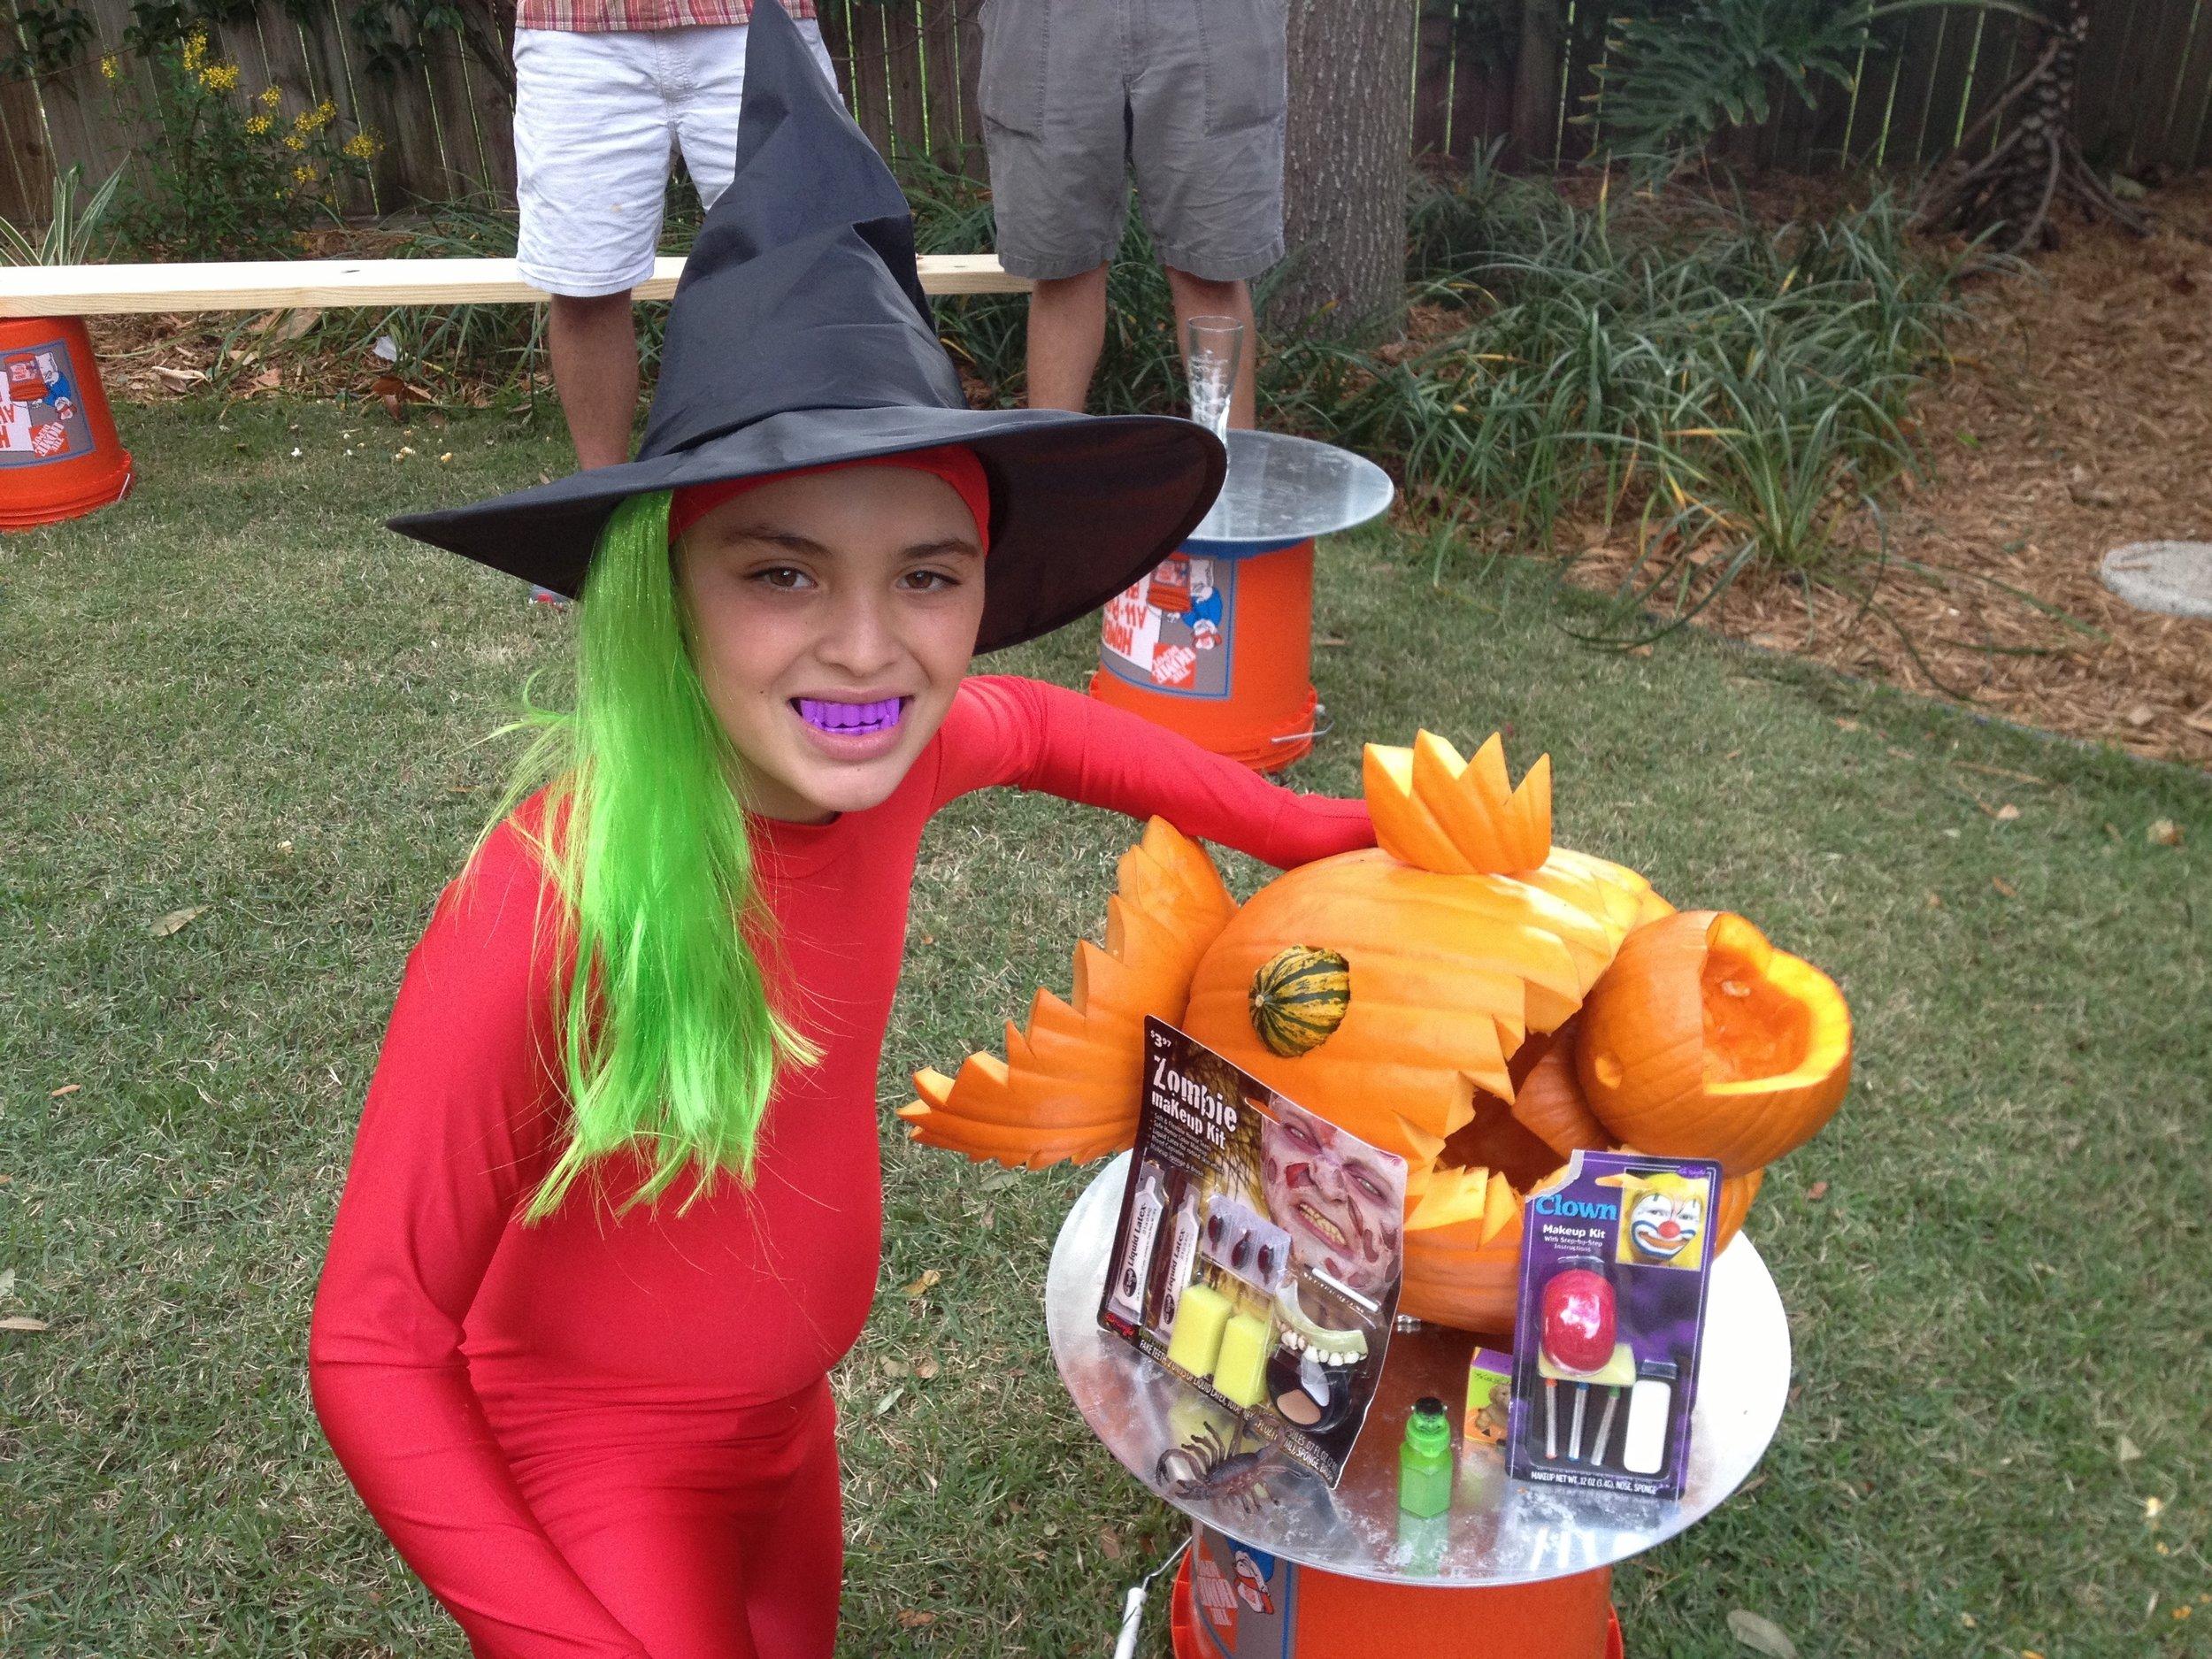 My nephew celebrating Halloween